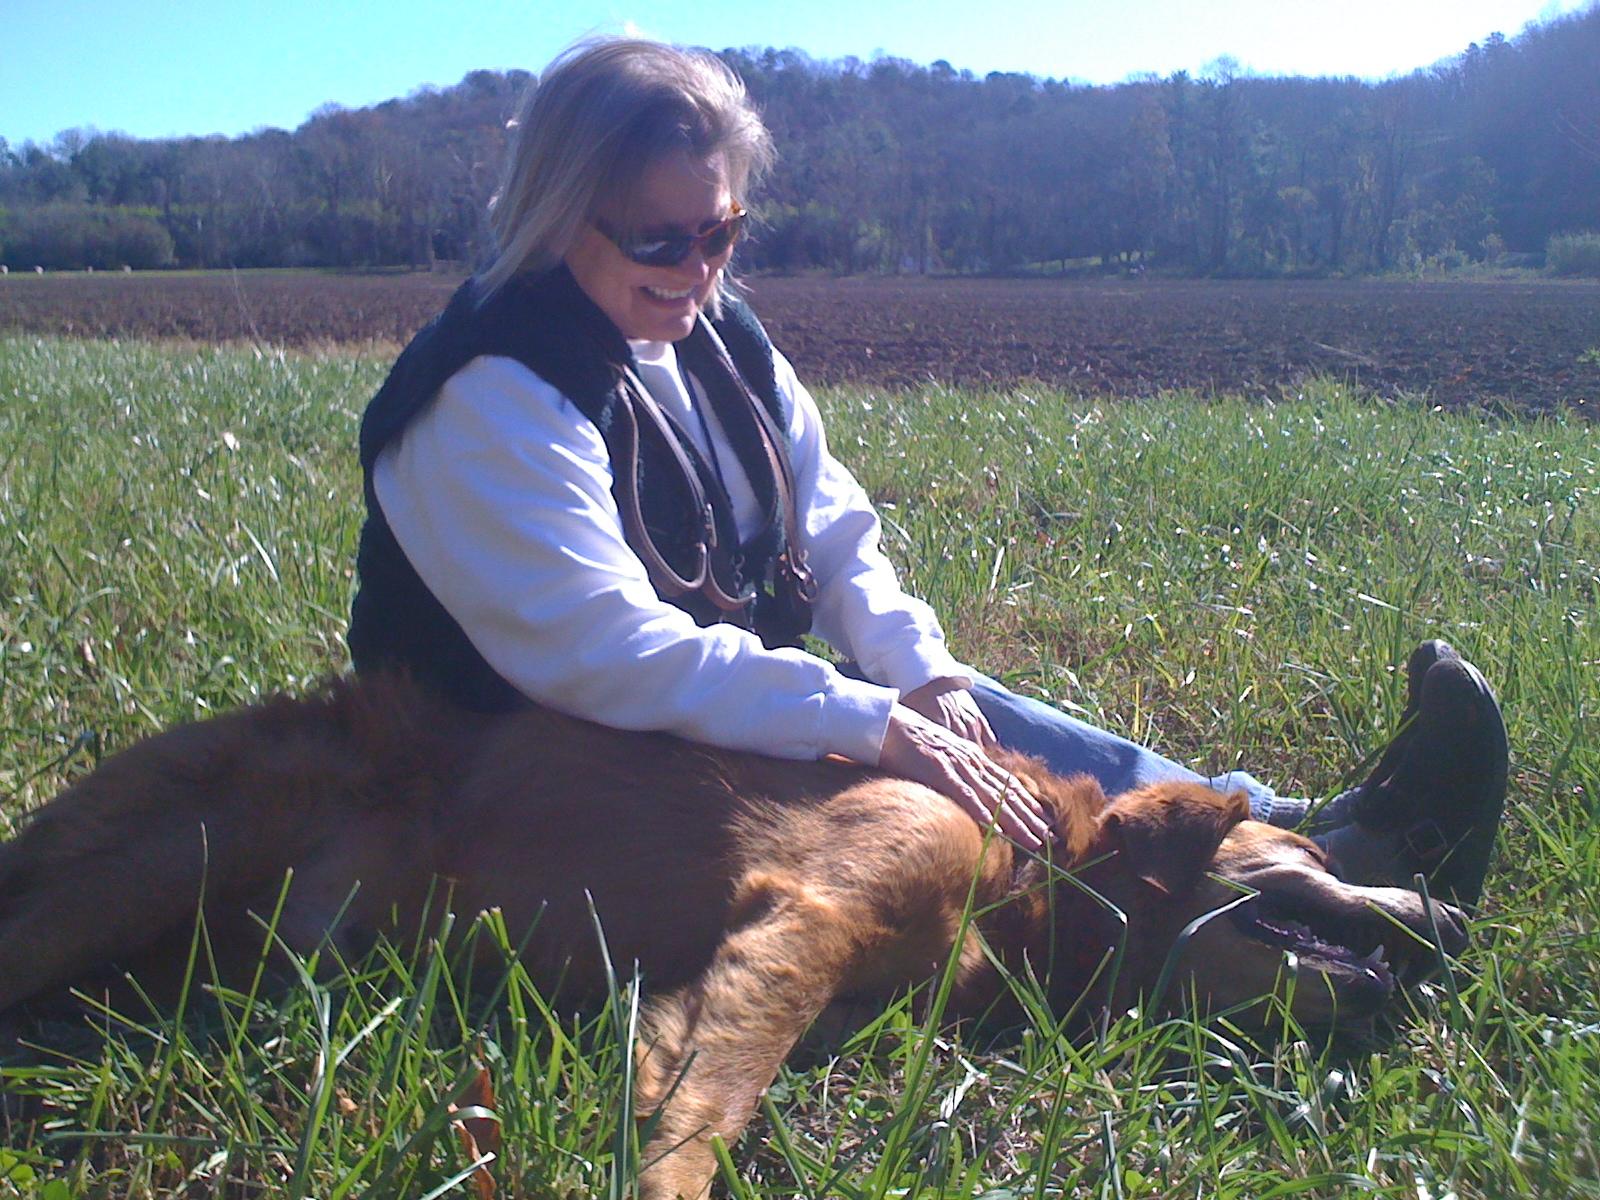 Providing for Companion Animals